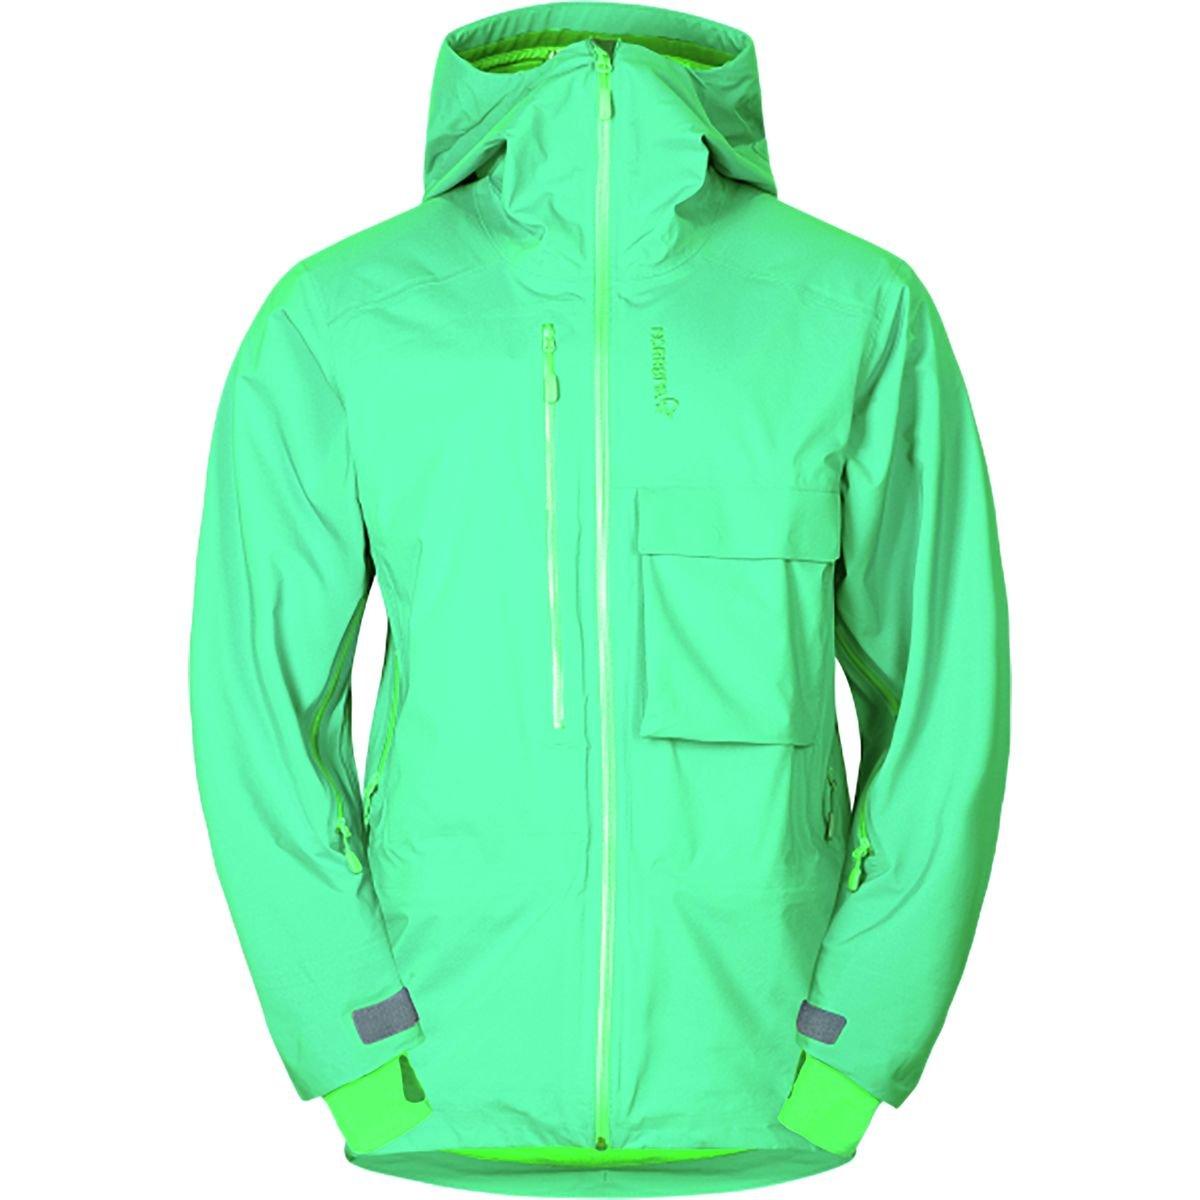 NORRONA(ノローナ) Lyngen Driflex3 Jacket Men's 3200-15 B013Q9OJN0 M|Chrome Green Chrome Green M